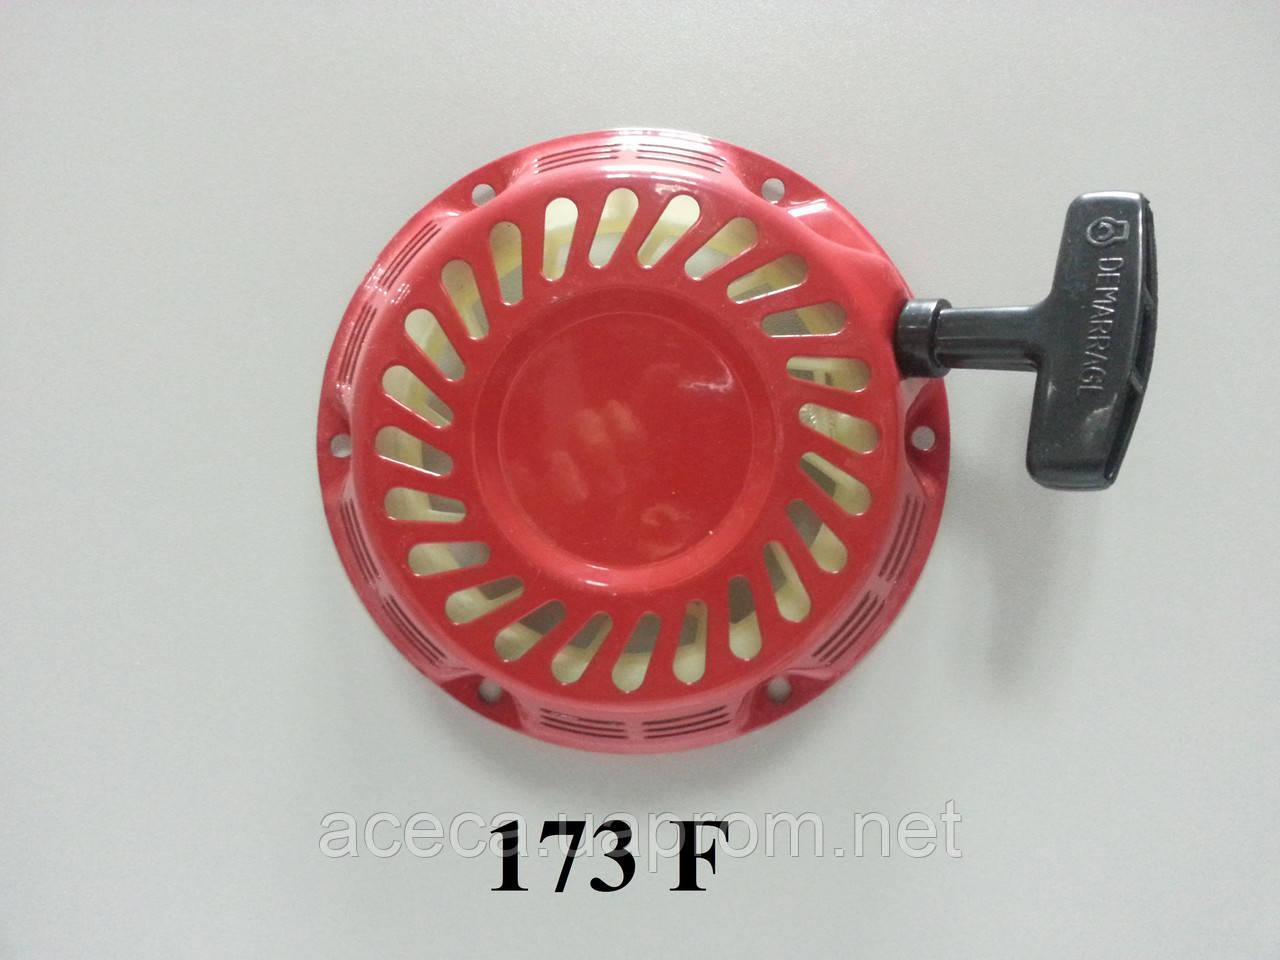 Стартер (кикстартер) электрогенератора 173 F